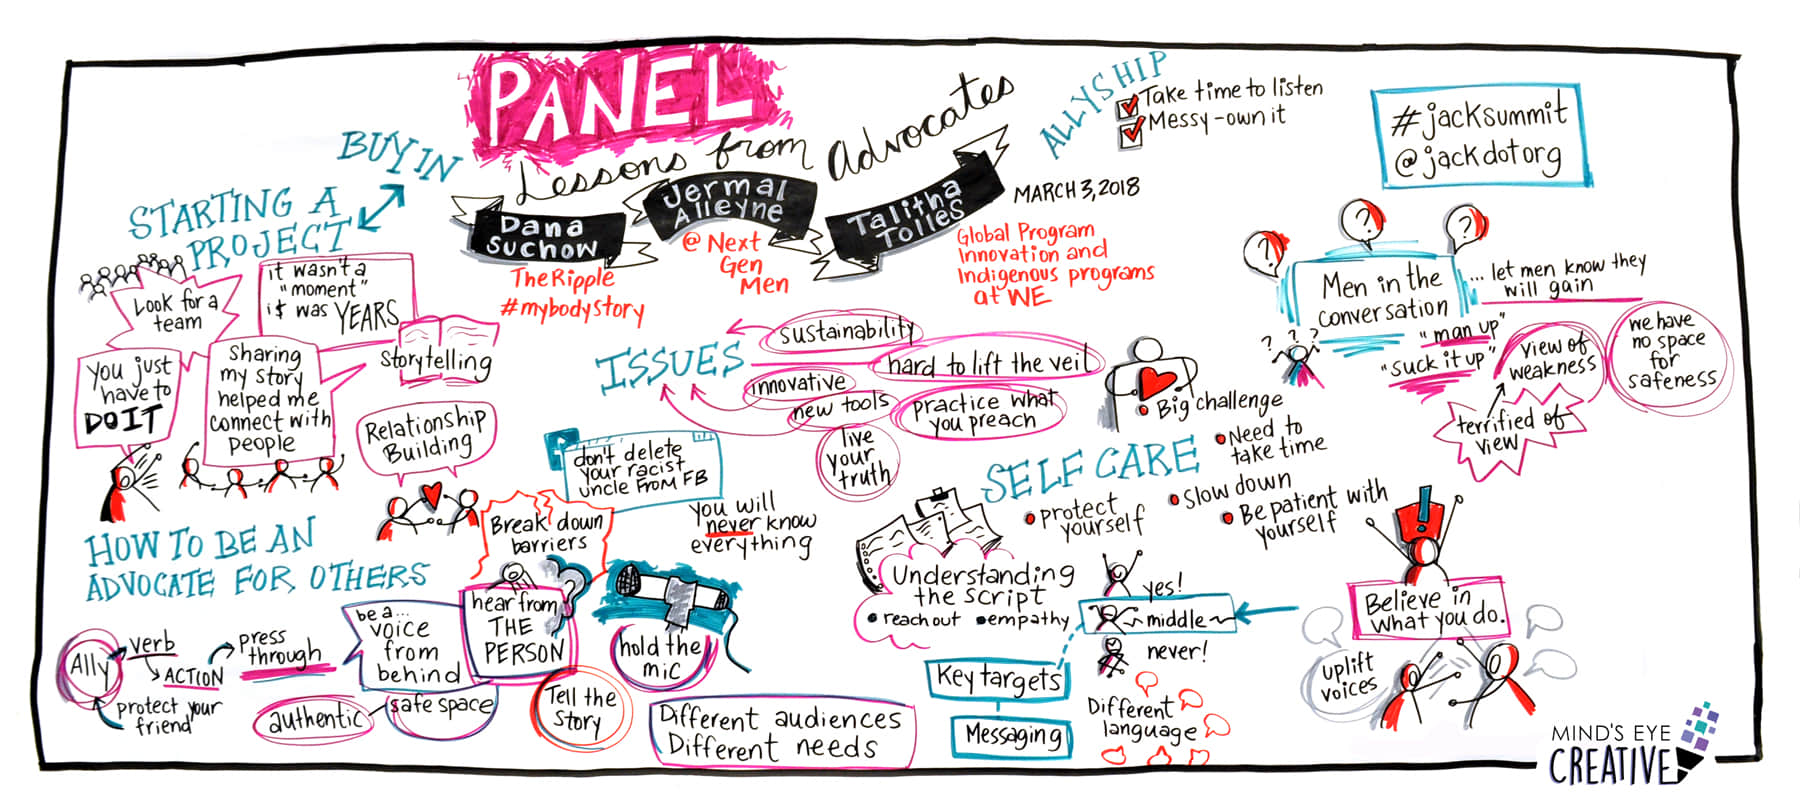 Graphic recording panel lesson with advocates